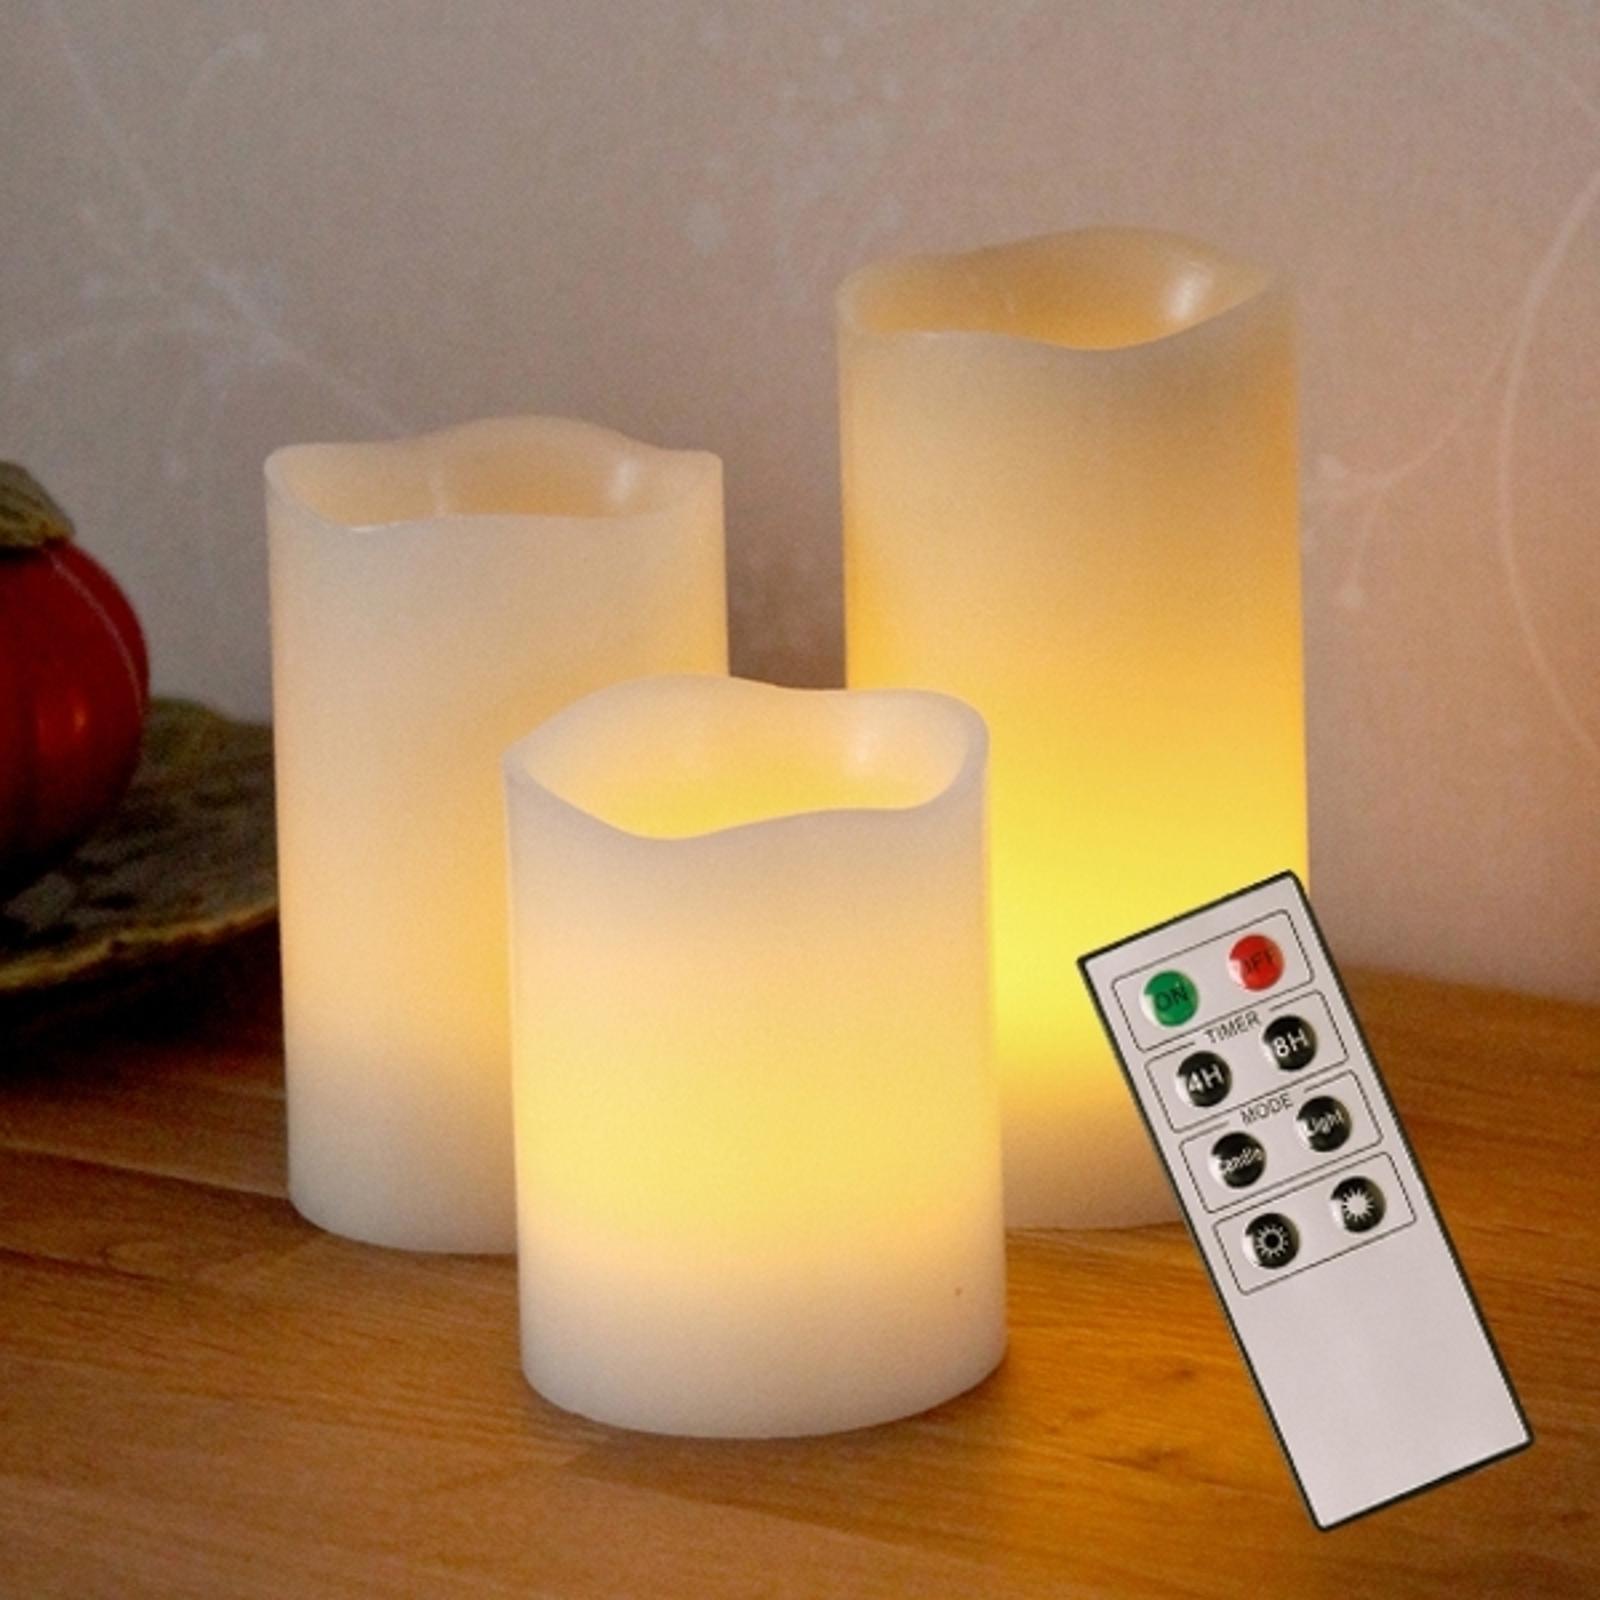 LED- Dekokerzen Candle Wax aus Wachs